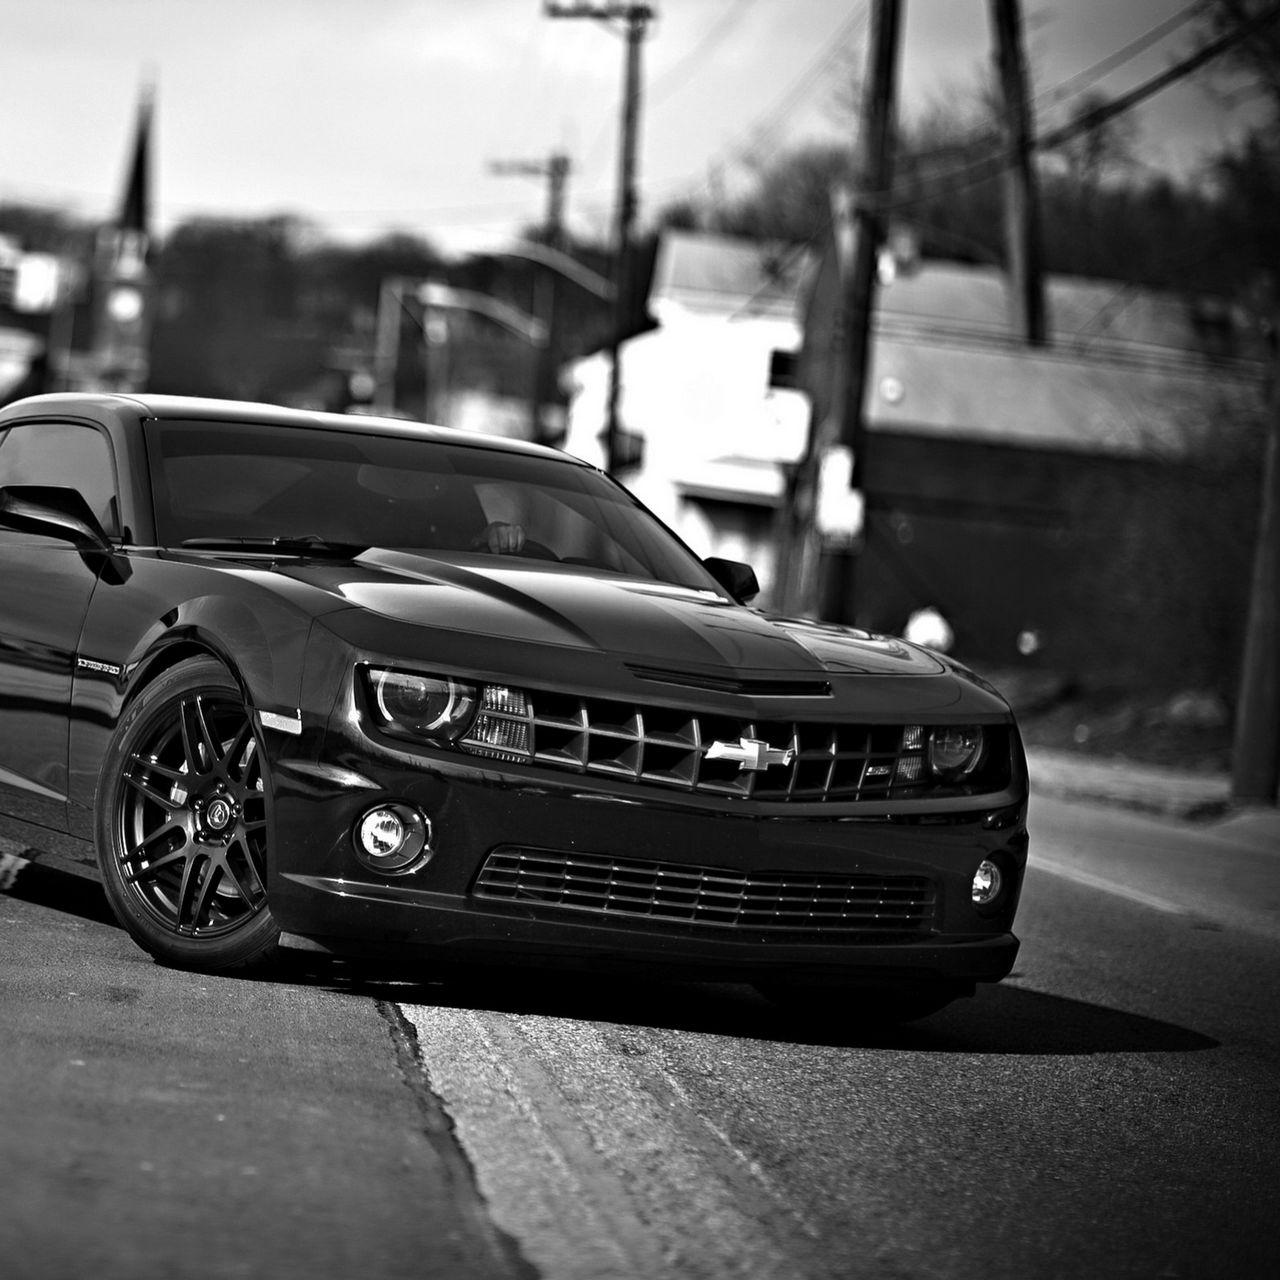 1280x1280 Wallpaper chevrolet camaro, chevrolet, cars, front view, black white